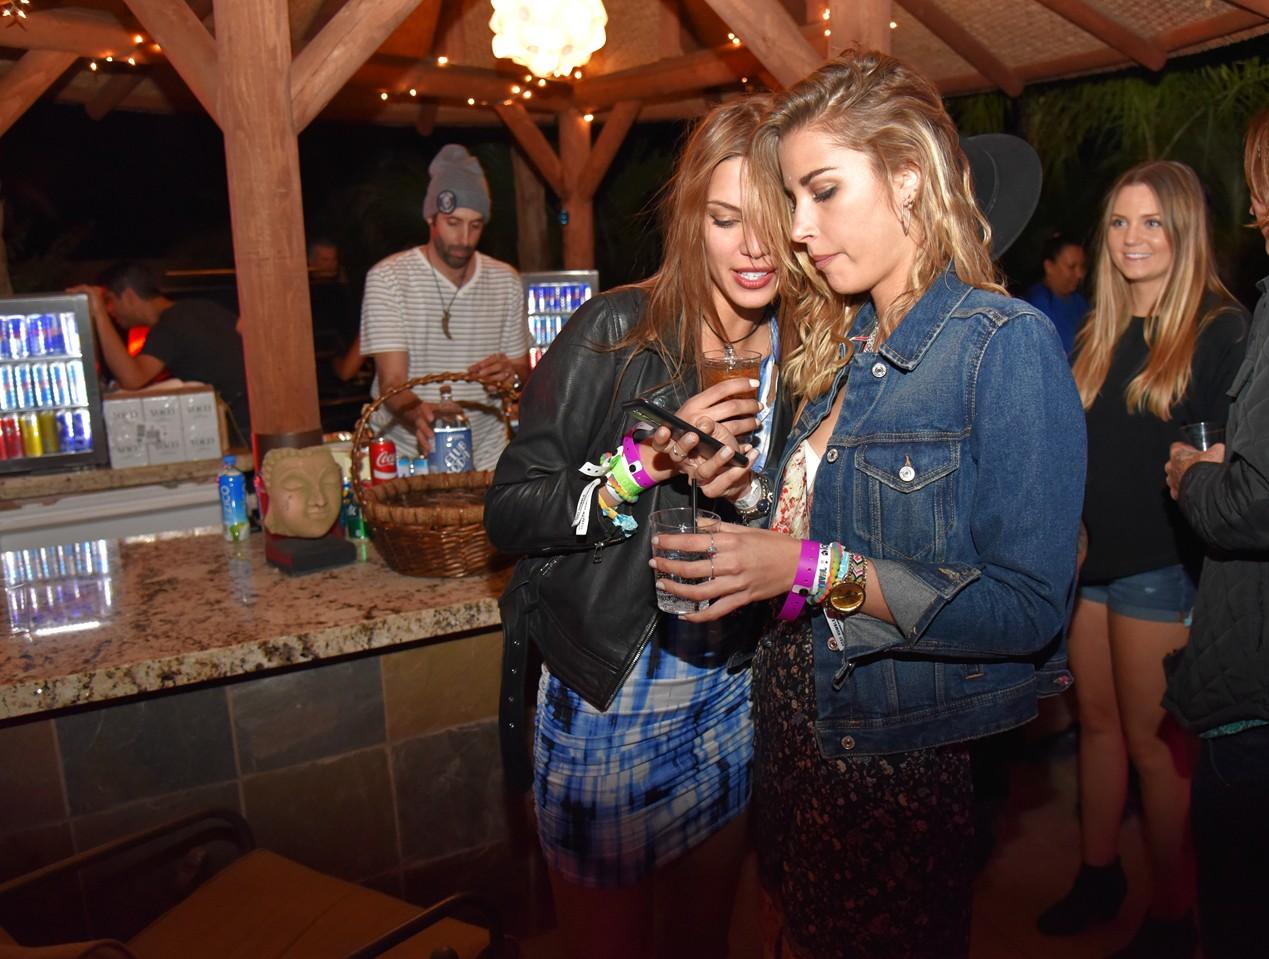 Bob Zangrillo party, Coachella, spanish girls